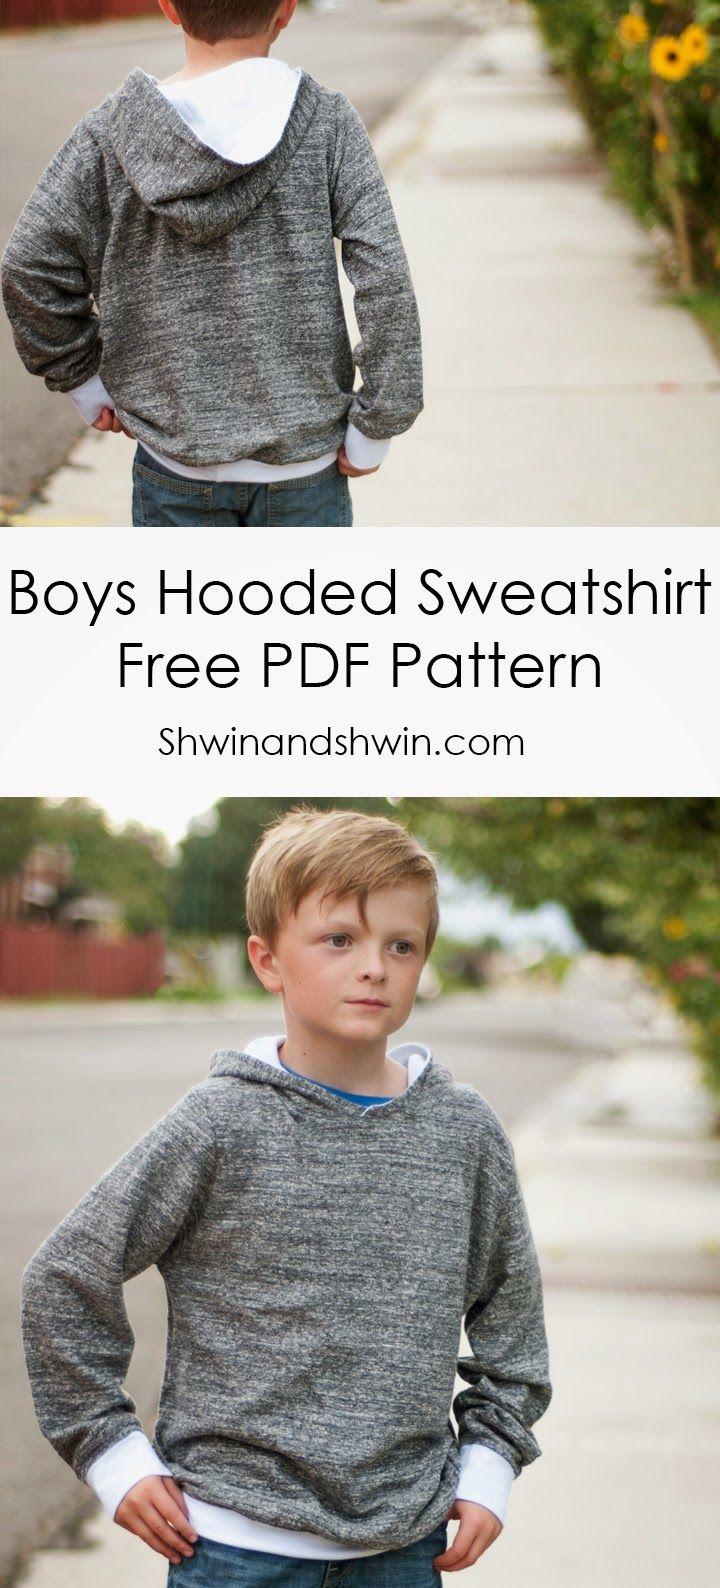 http://shwinandshwin.com/2014/09/boys-hooded-sweatshirt-free-pdf-pattern.html aqui el bueno